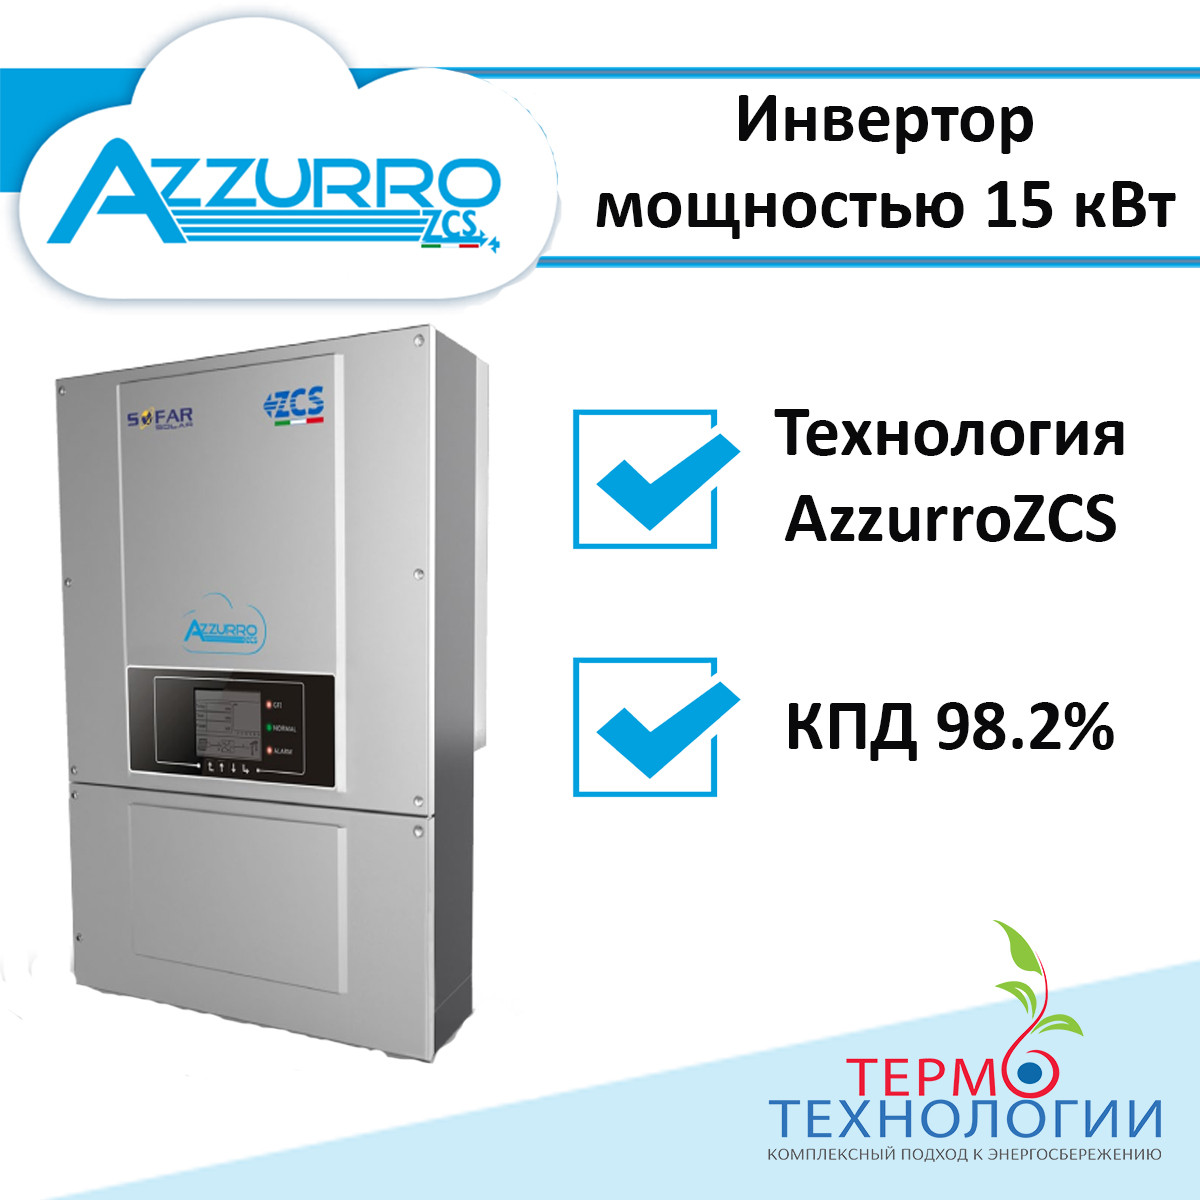 Солнечный инвертор сетевой AZZURRO 15 кВт, 3Ф